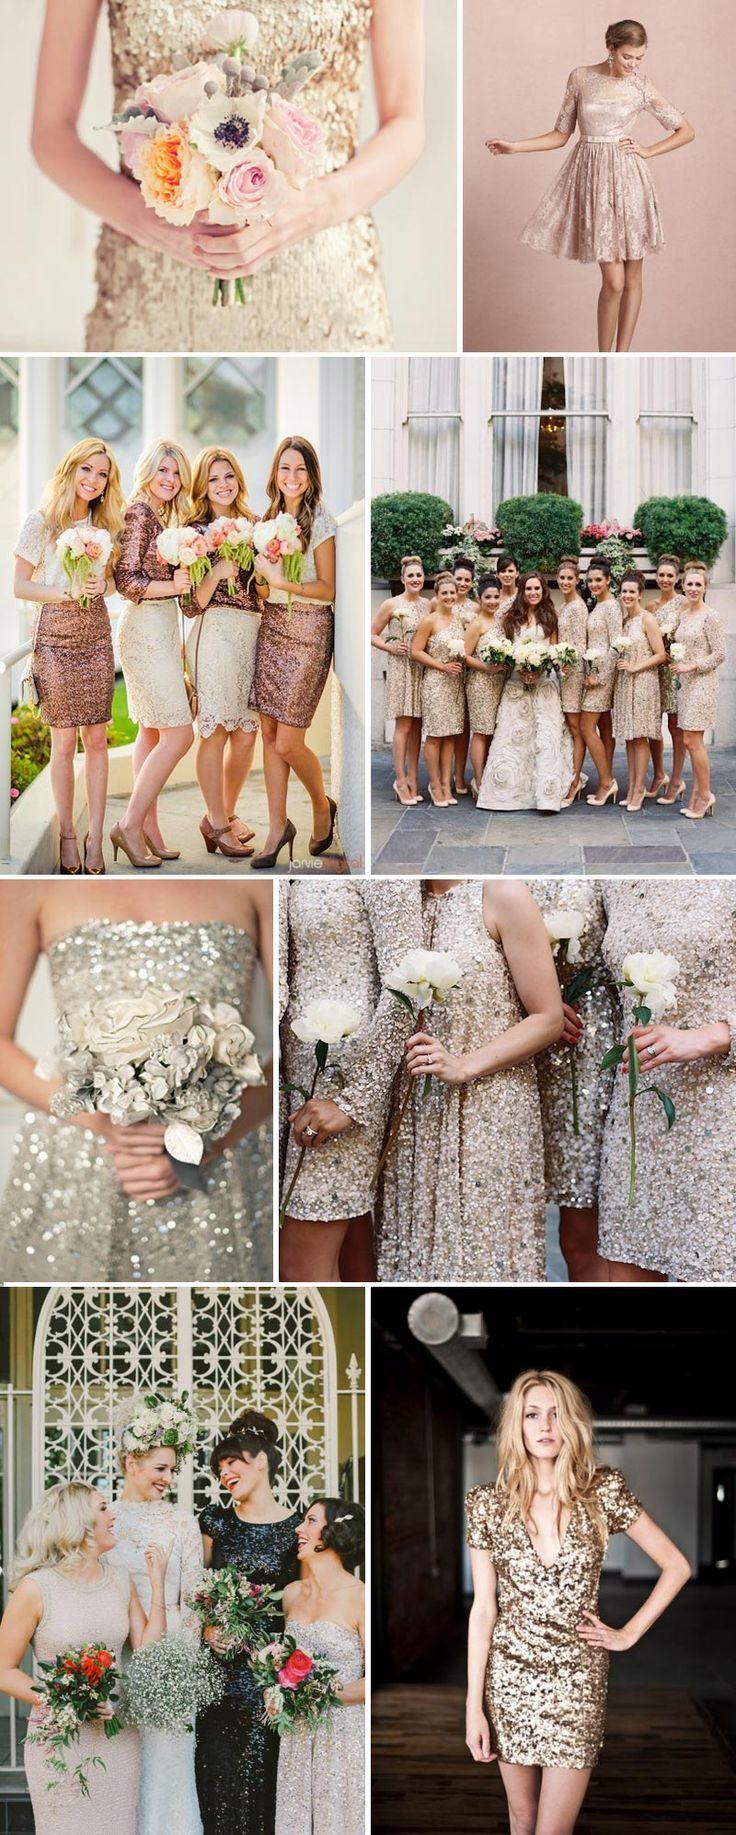 Metallic, sequins, sparkly ~ winter wedding?